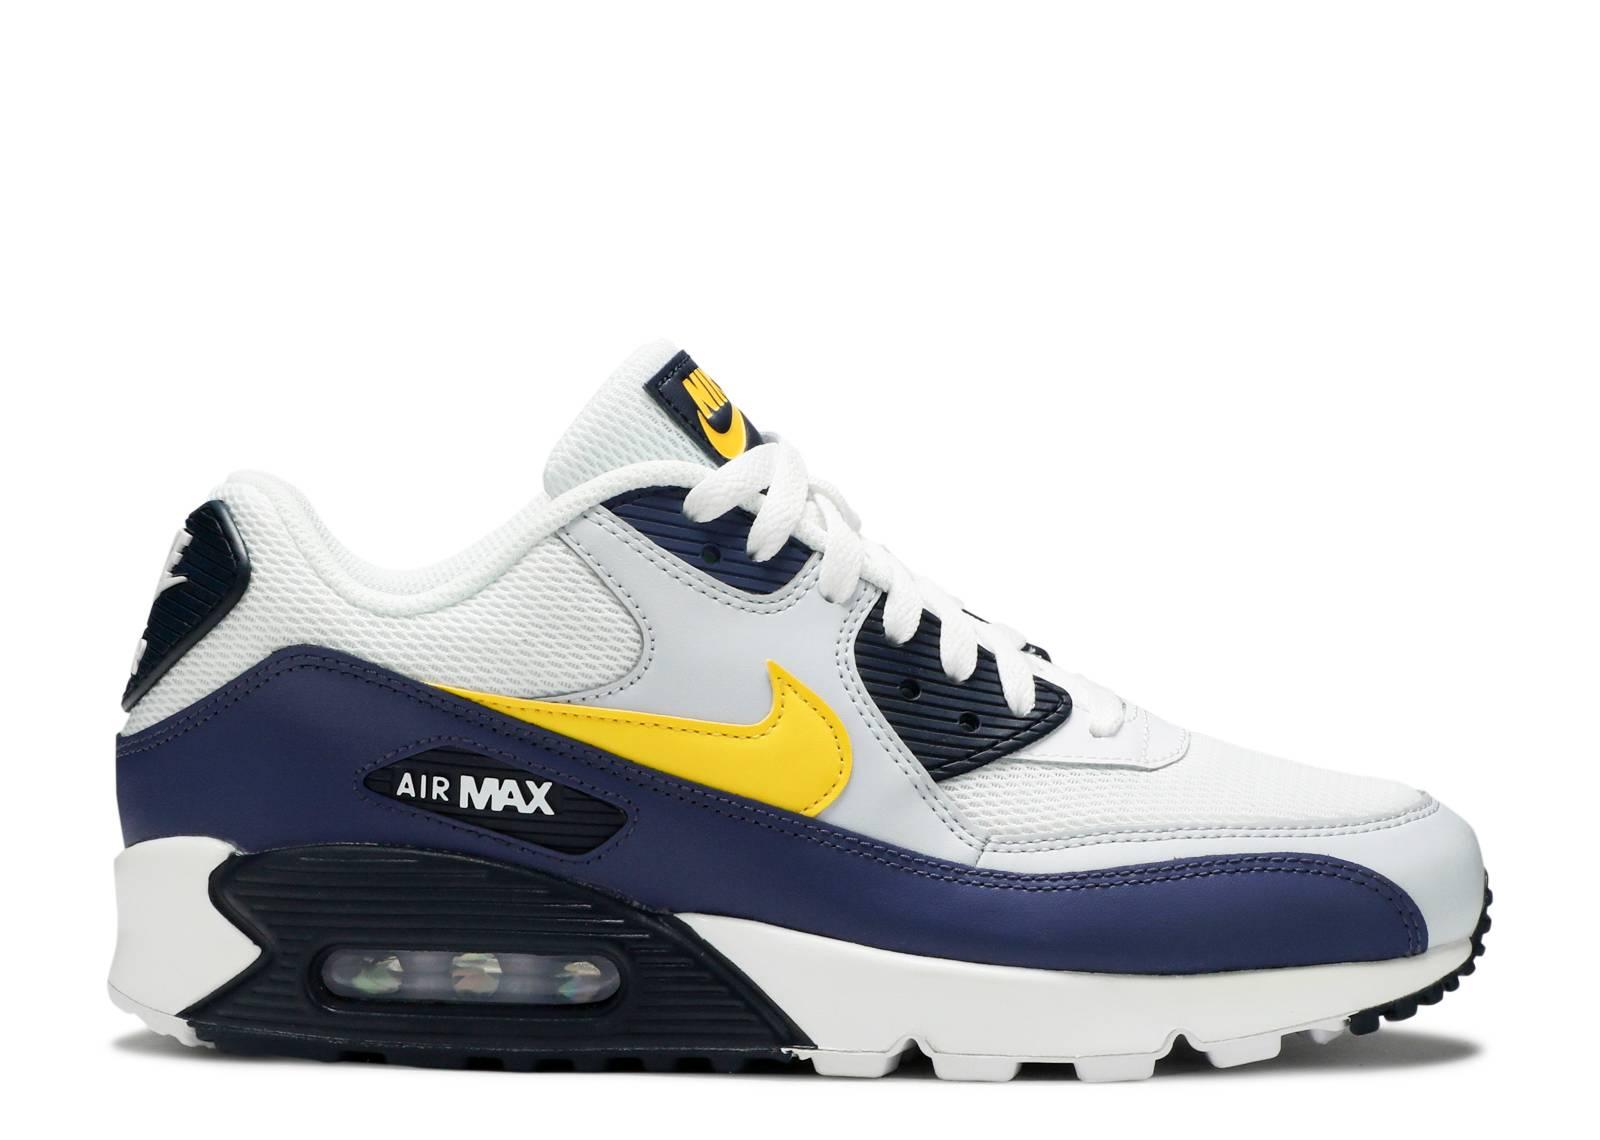 7366aab6ad1f Nike Air Max 90 Essential - Nike - aj1285 101 - white tour yellow ...